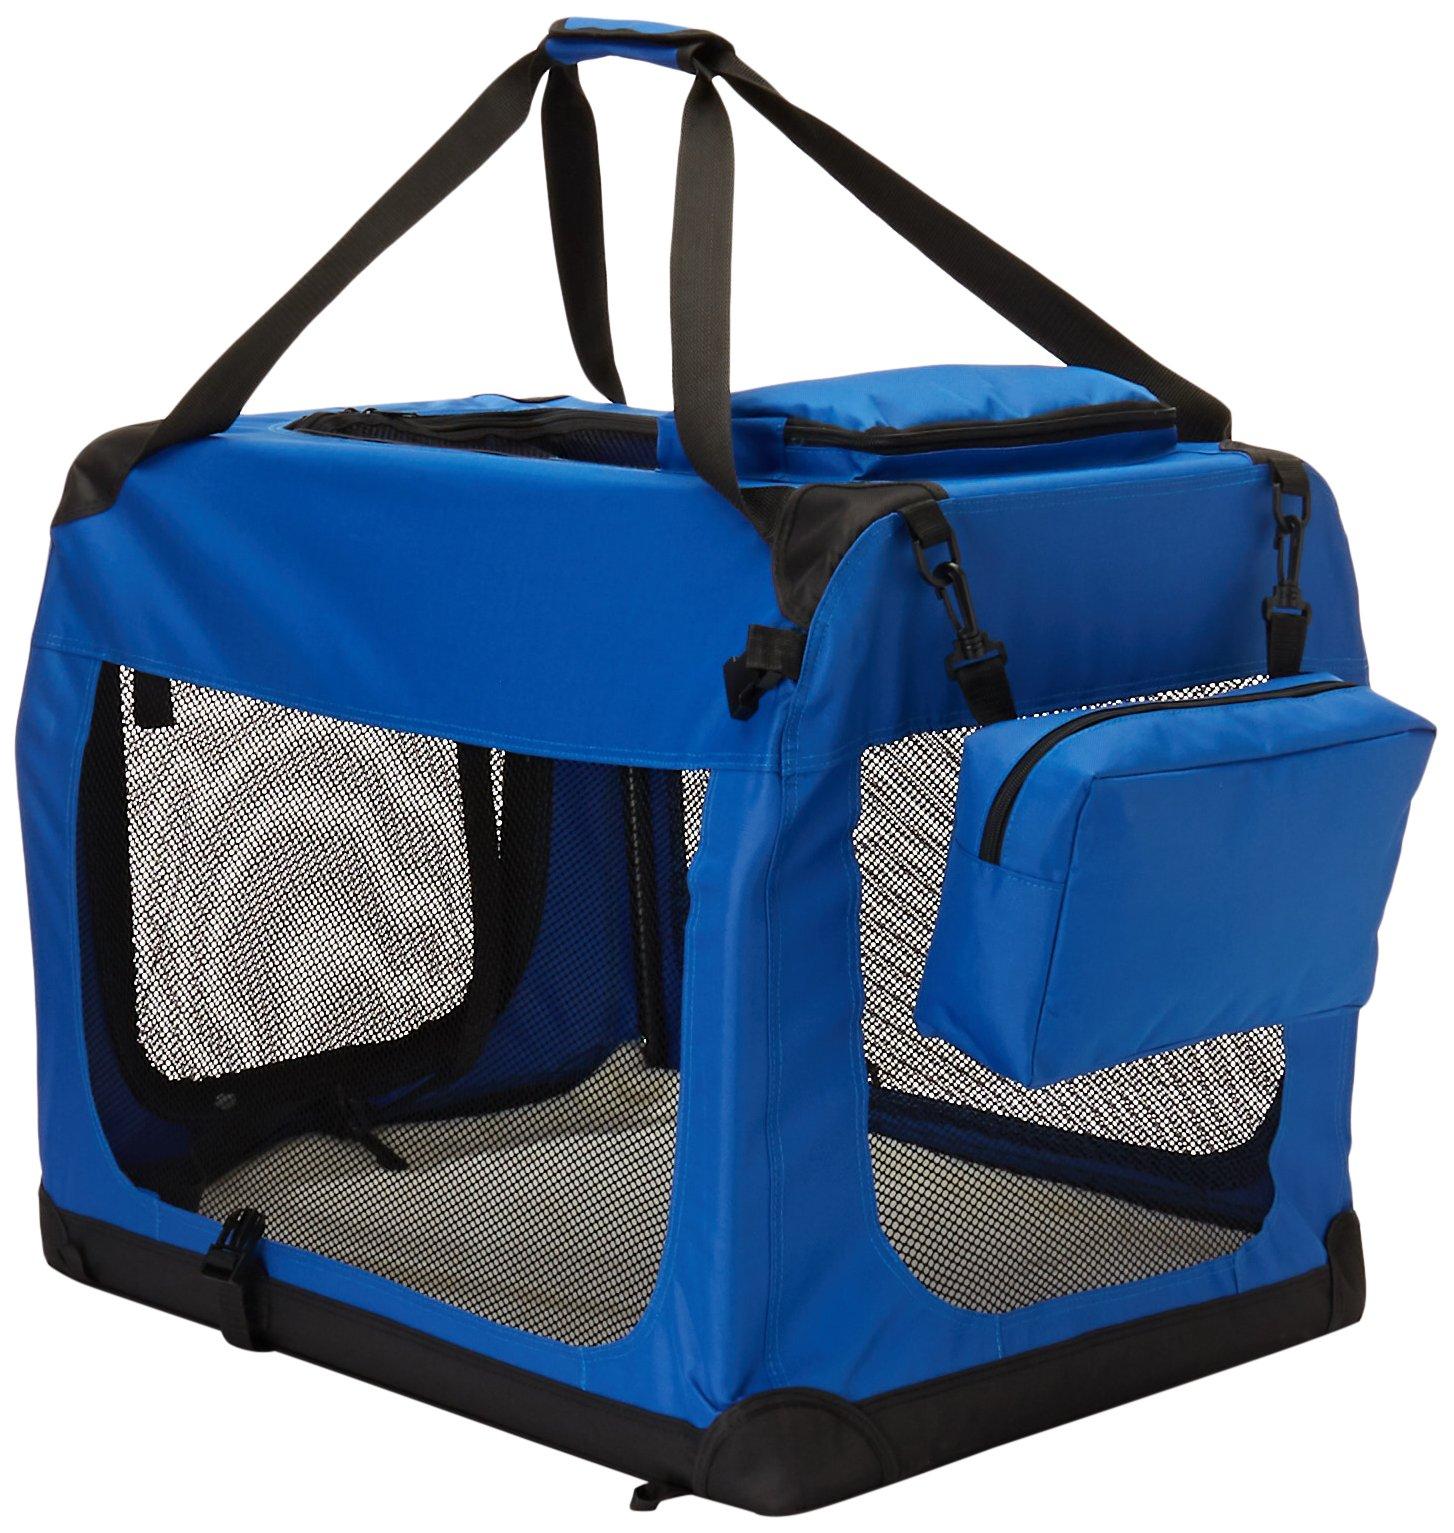 Go Pet Club AC28 Soft Dog Crate, Blue - Small (10 - 25 Lbs)